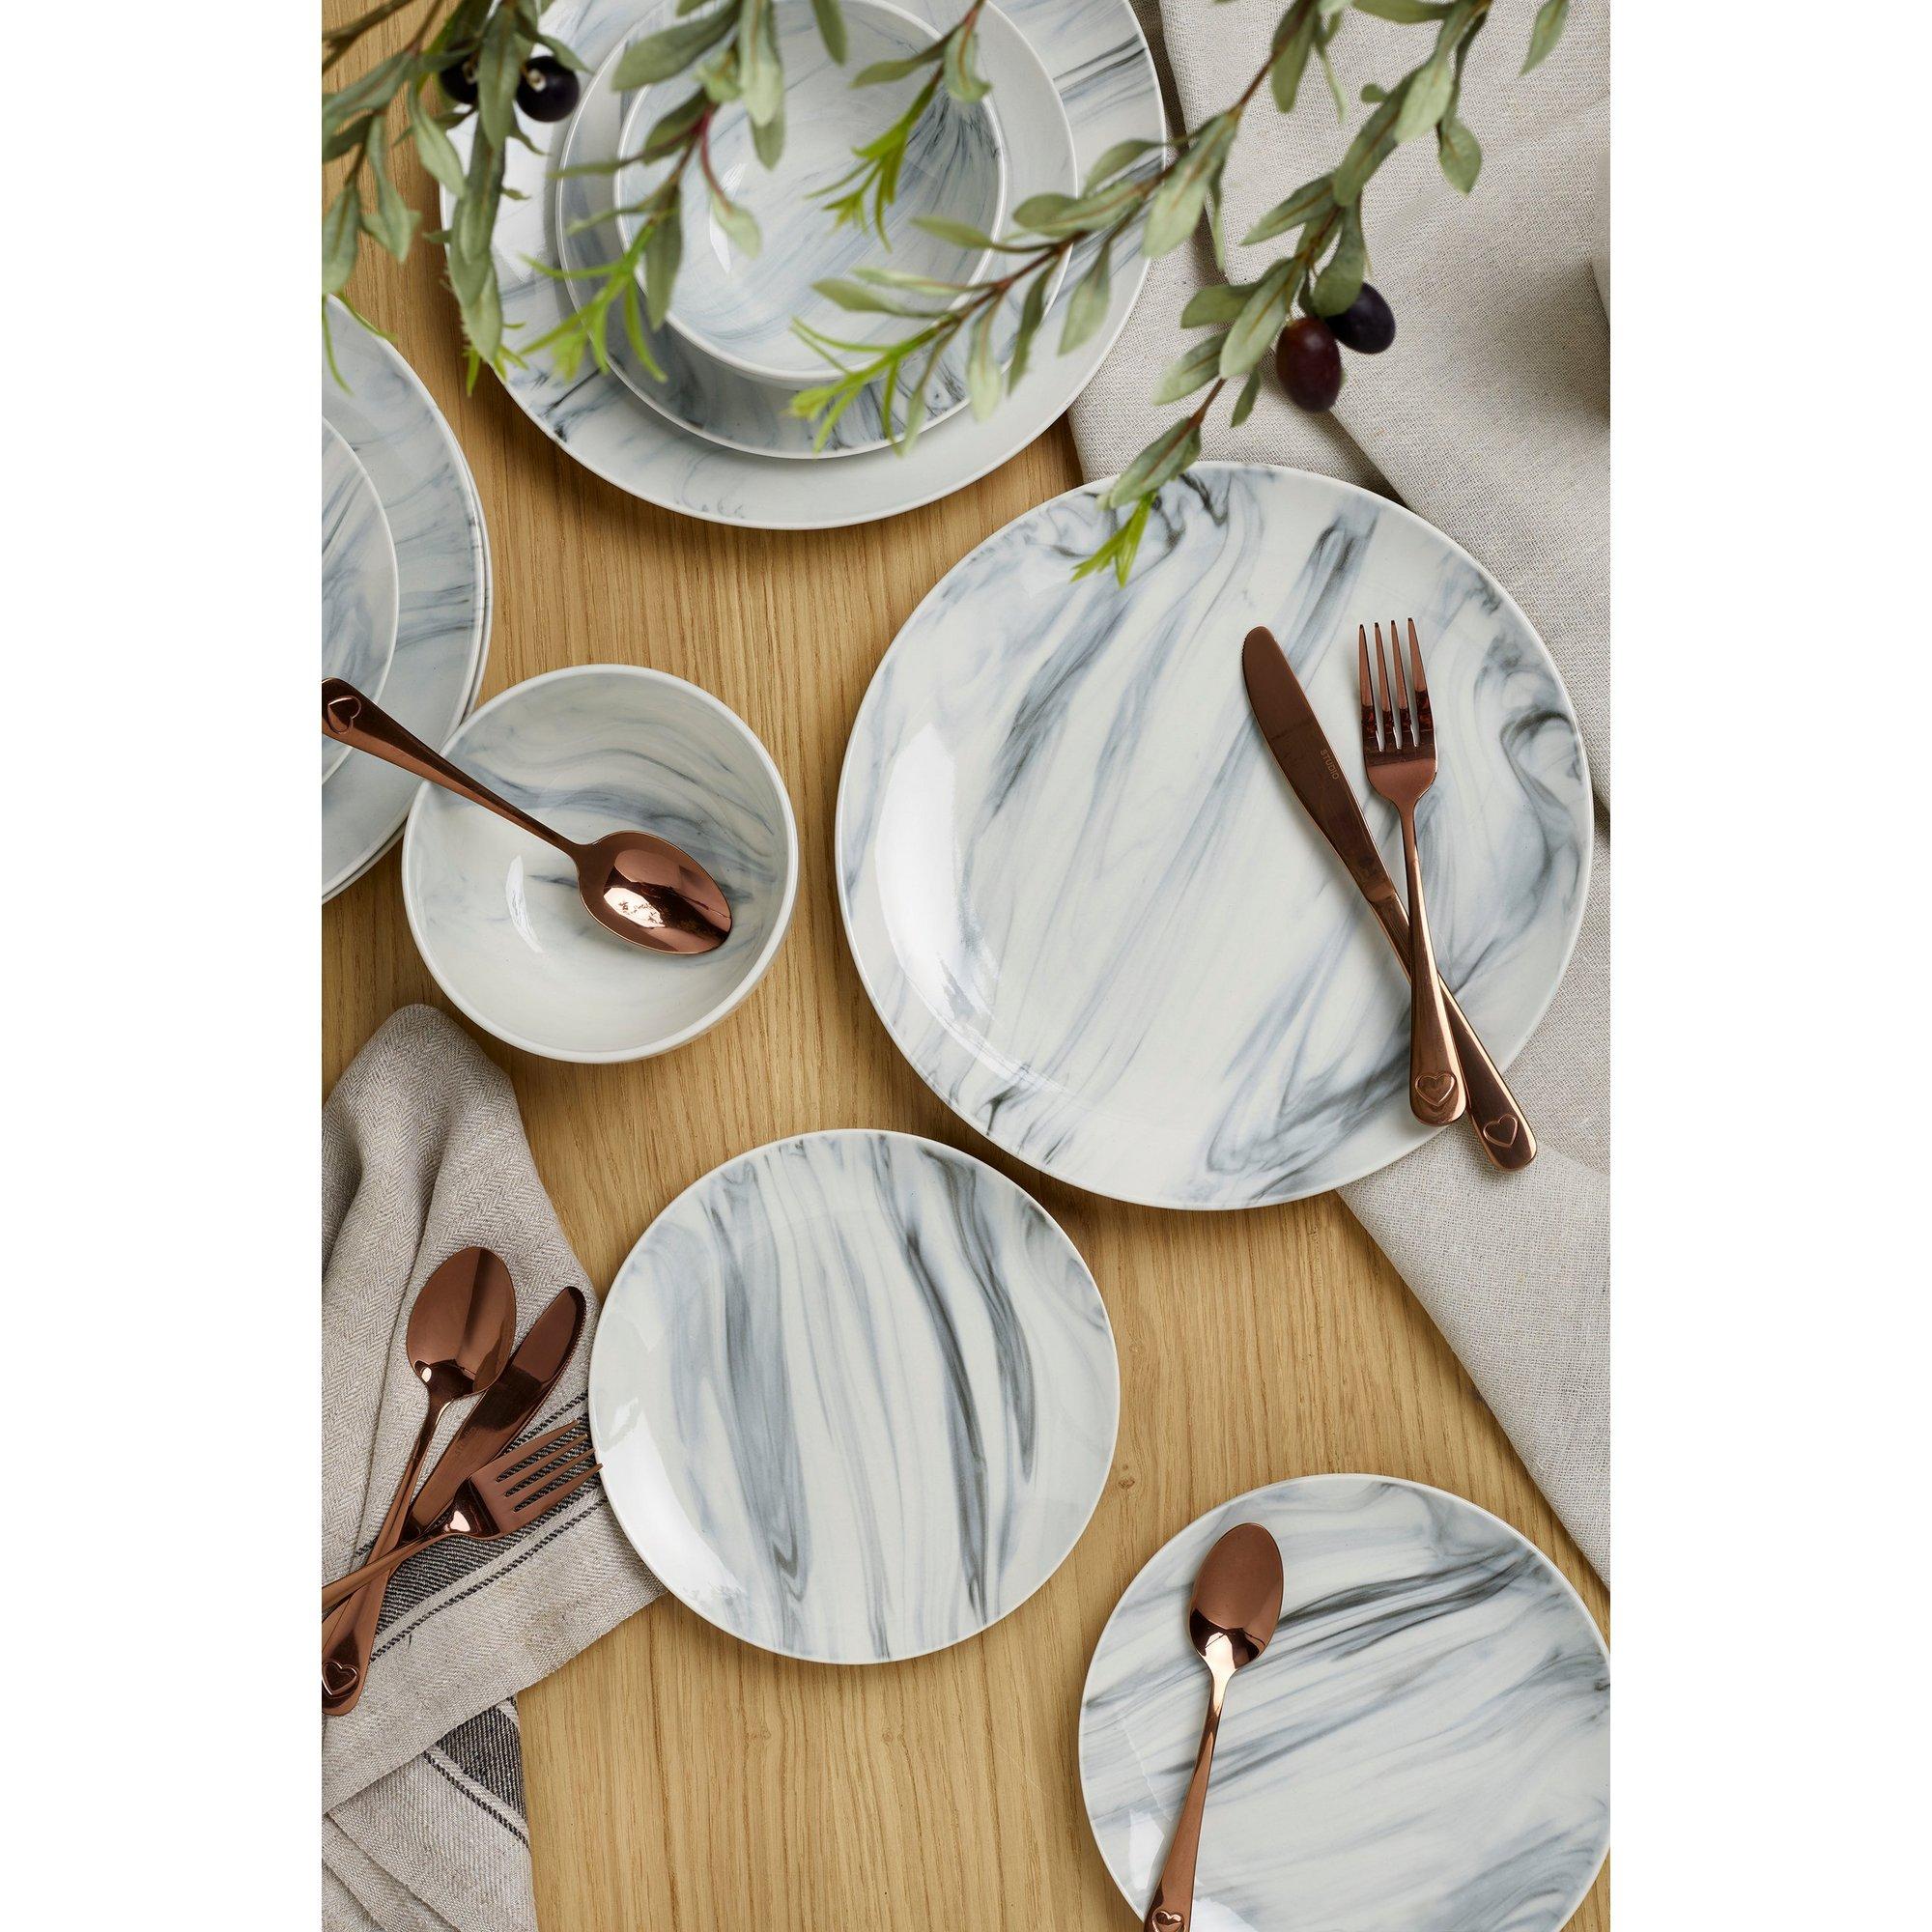 Image of 12-Piece Marble Glazed Dinner Set